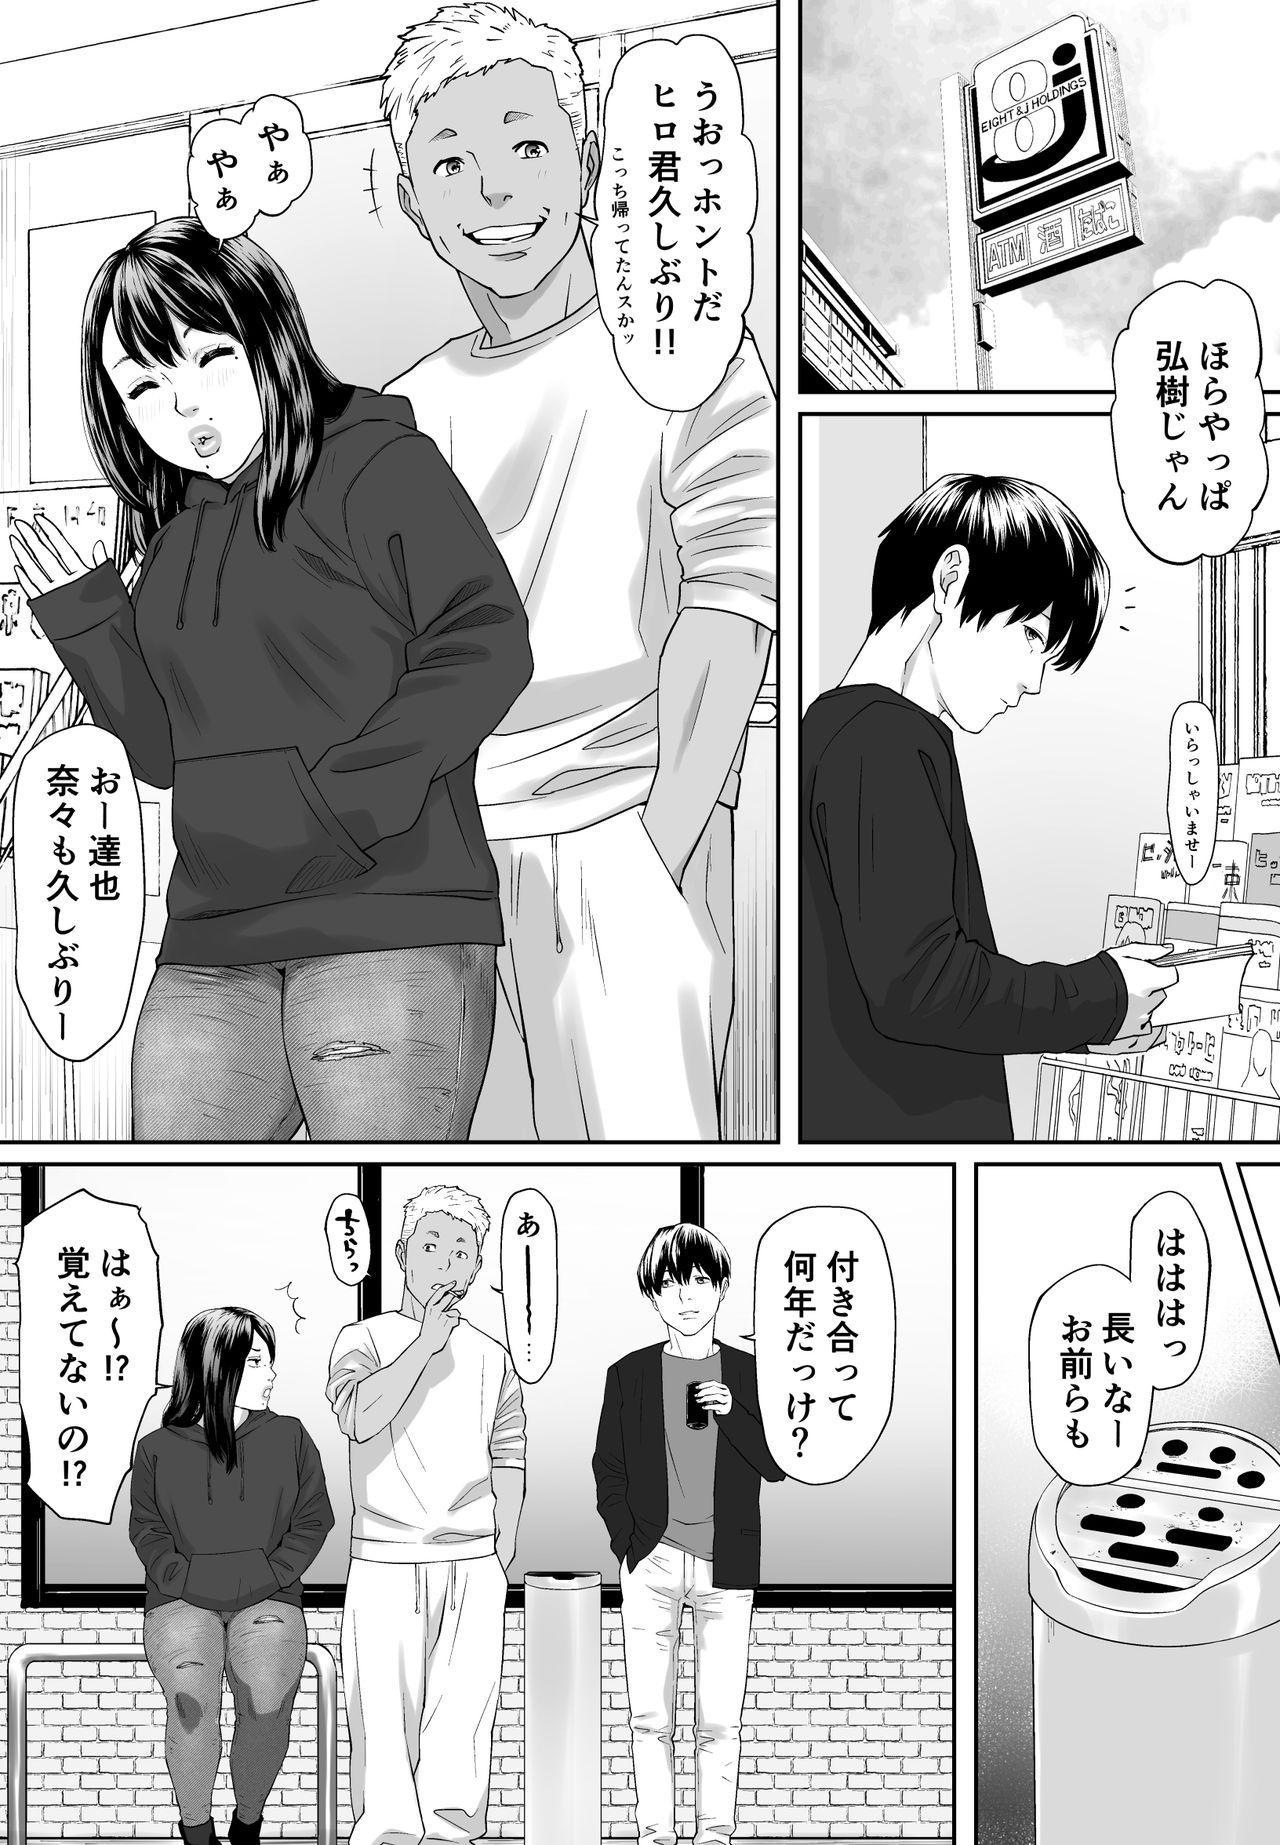 Mild Hentai NANA 2